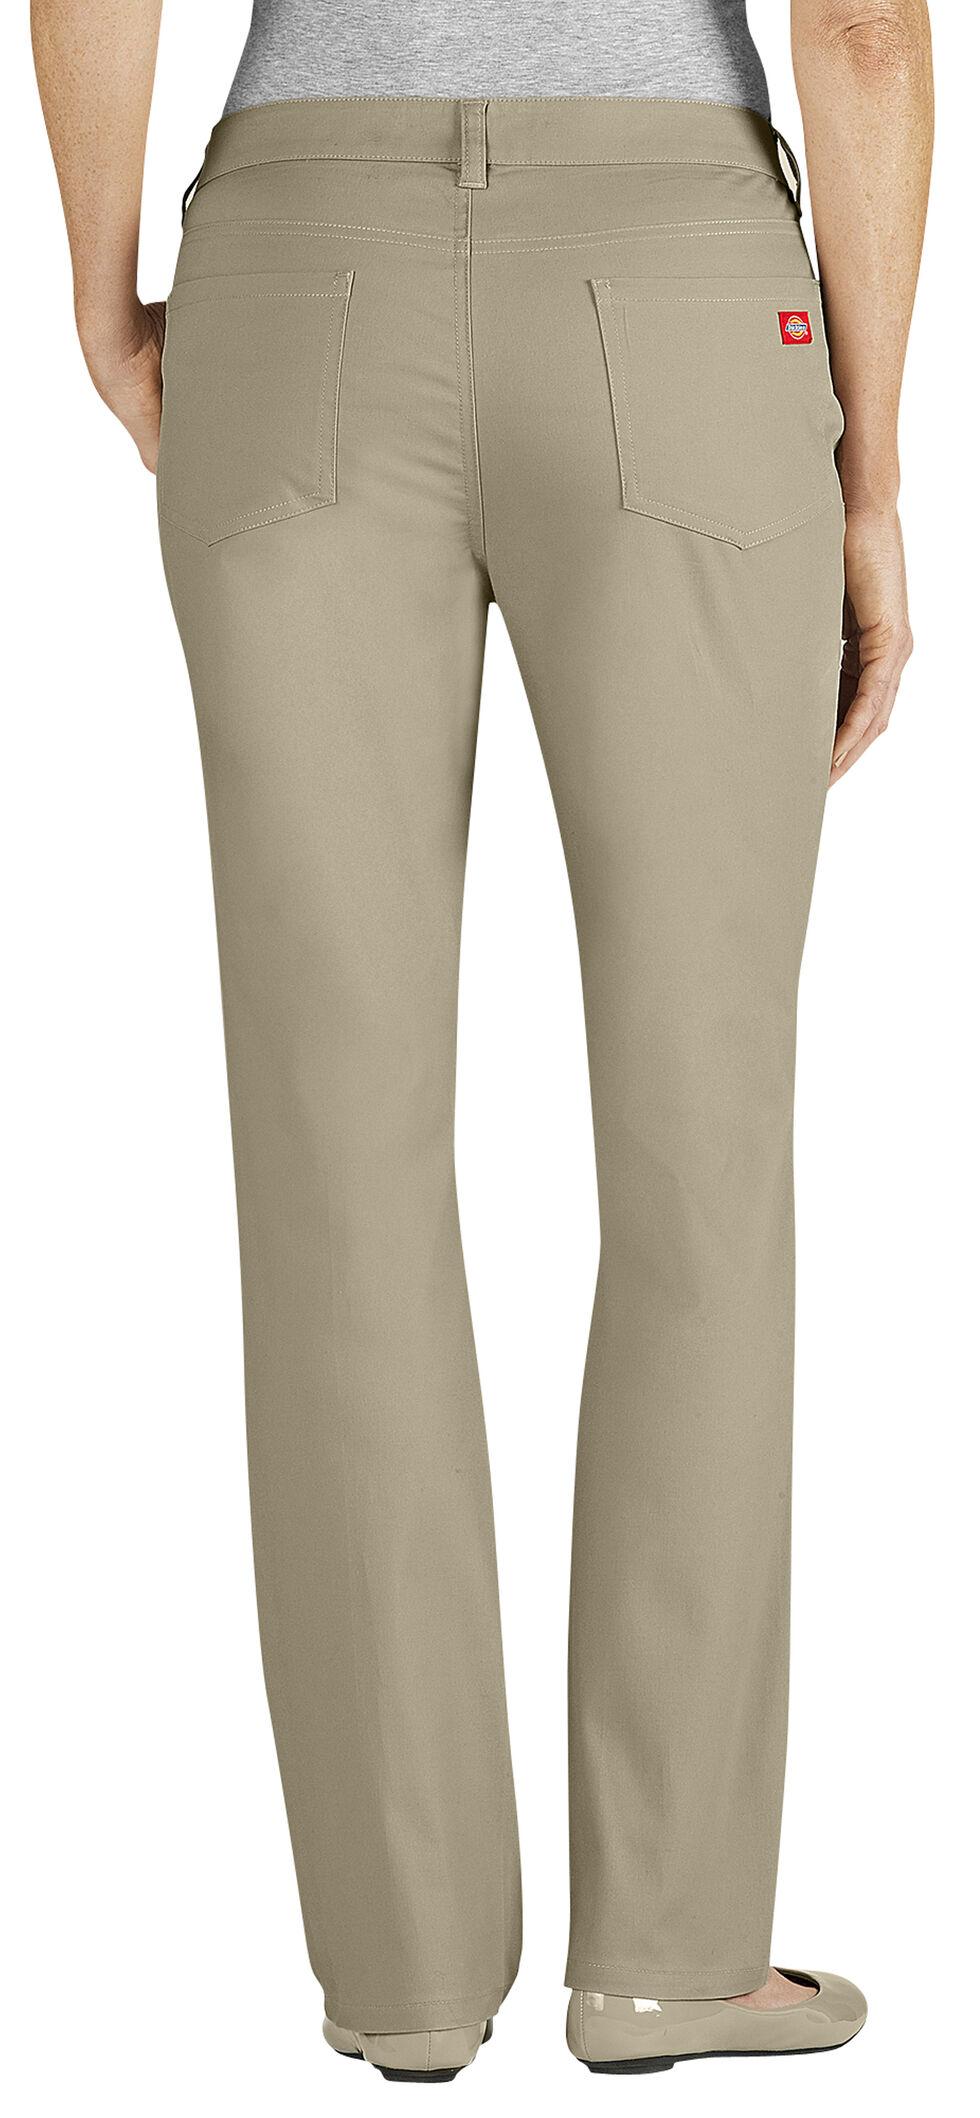 Dickies Women's Slim Fit 5-Pocket Stretch Twill Pants, Desert, hi-res